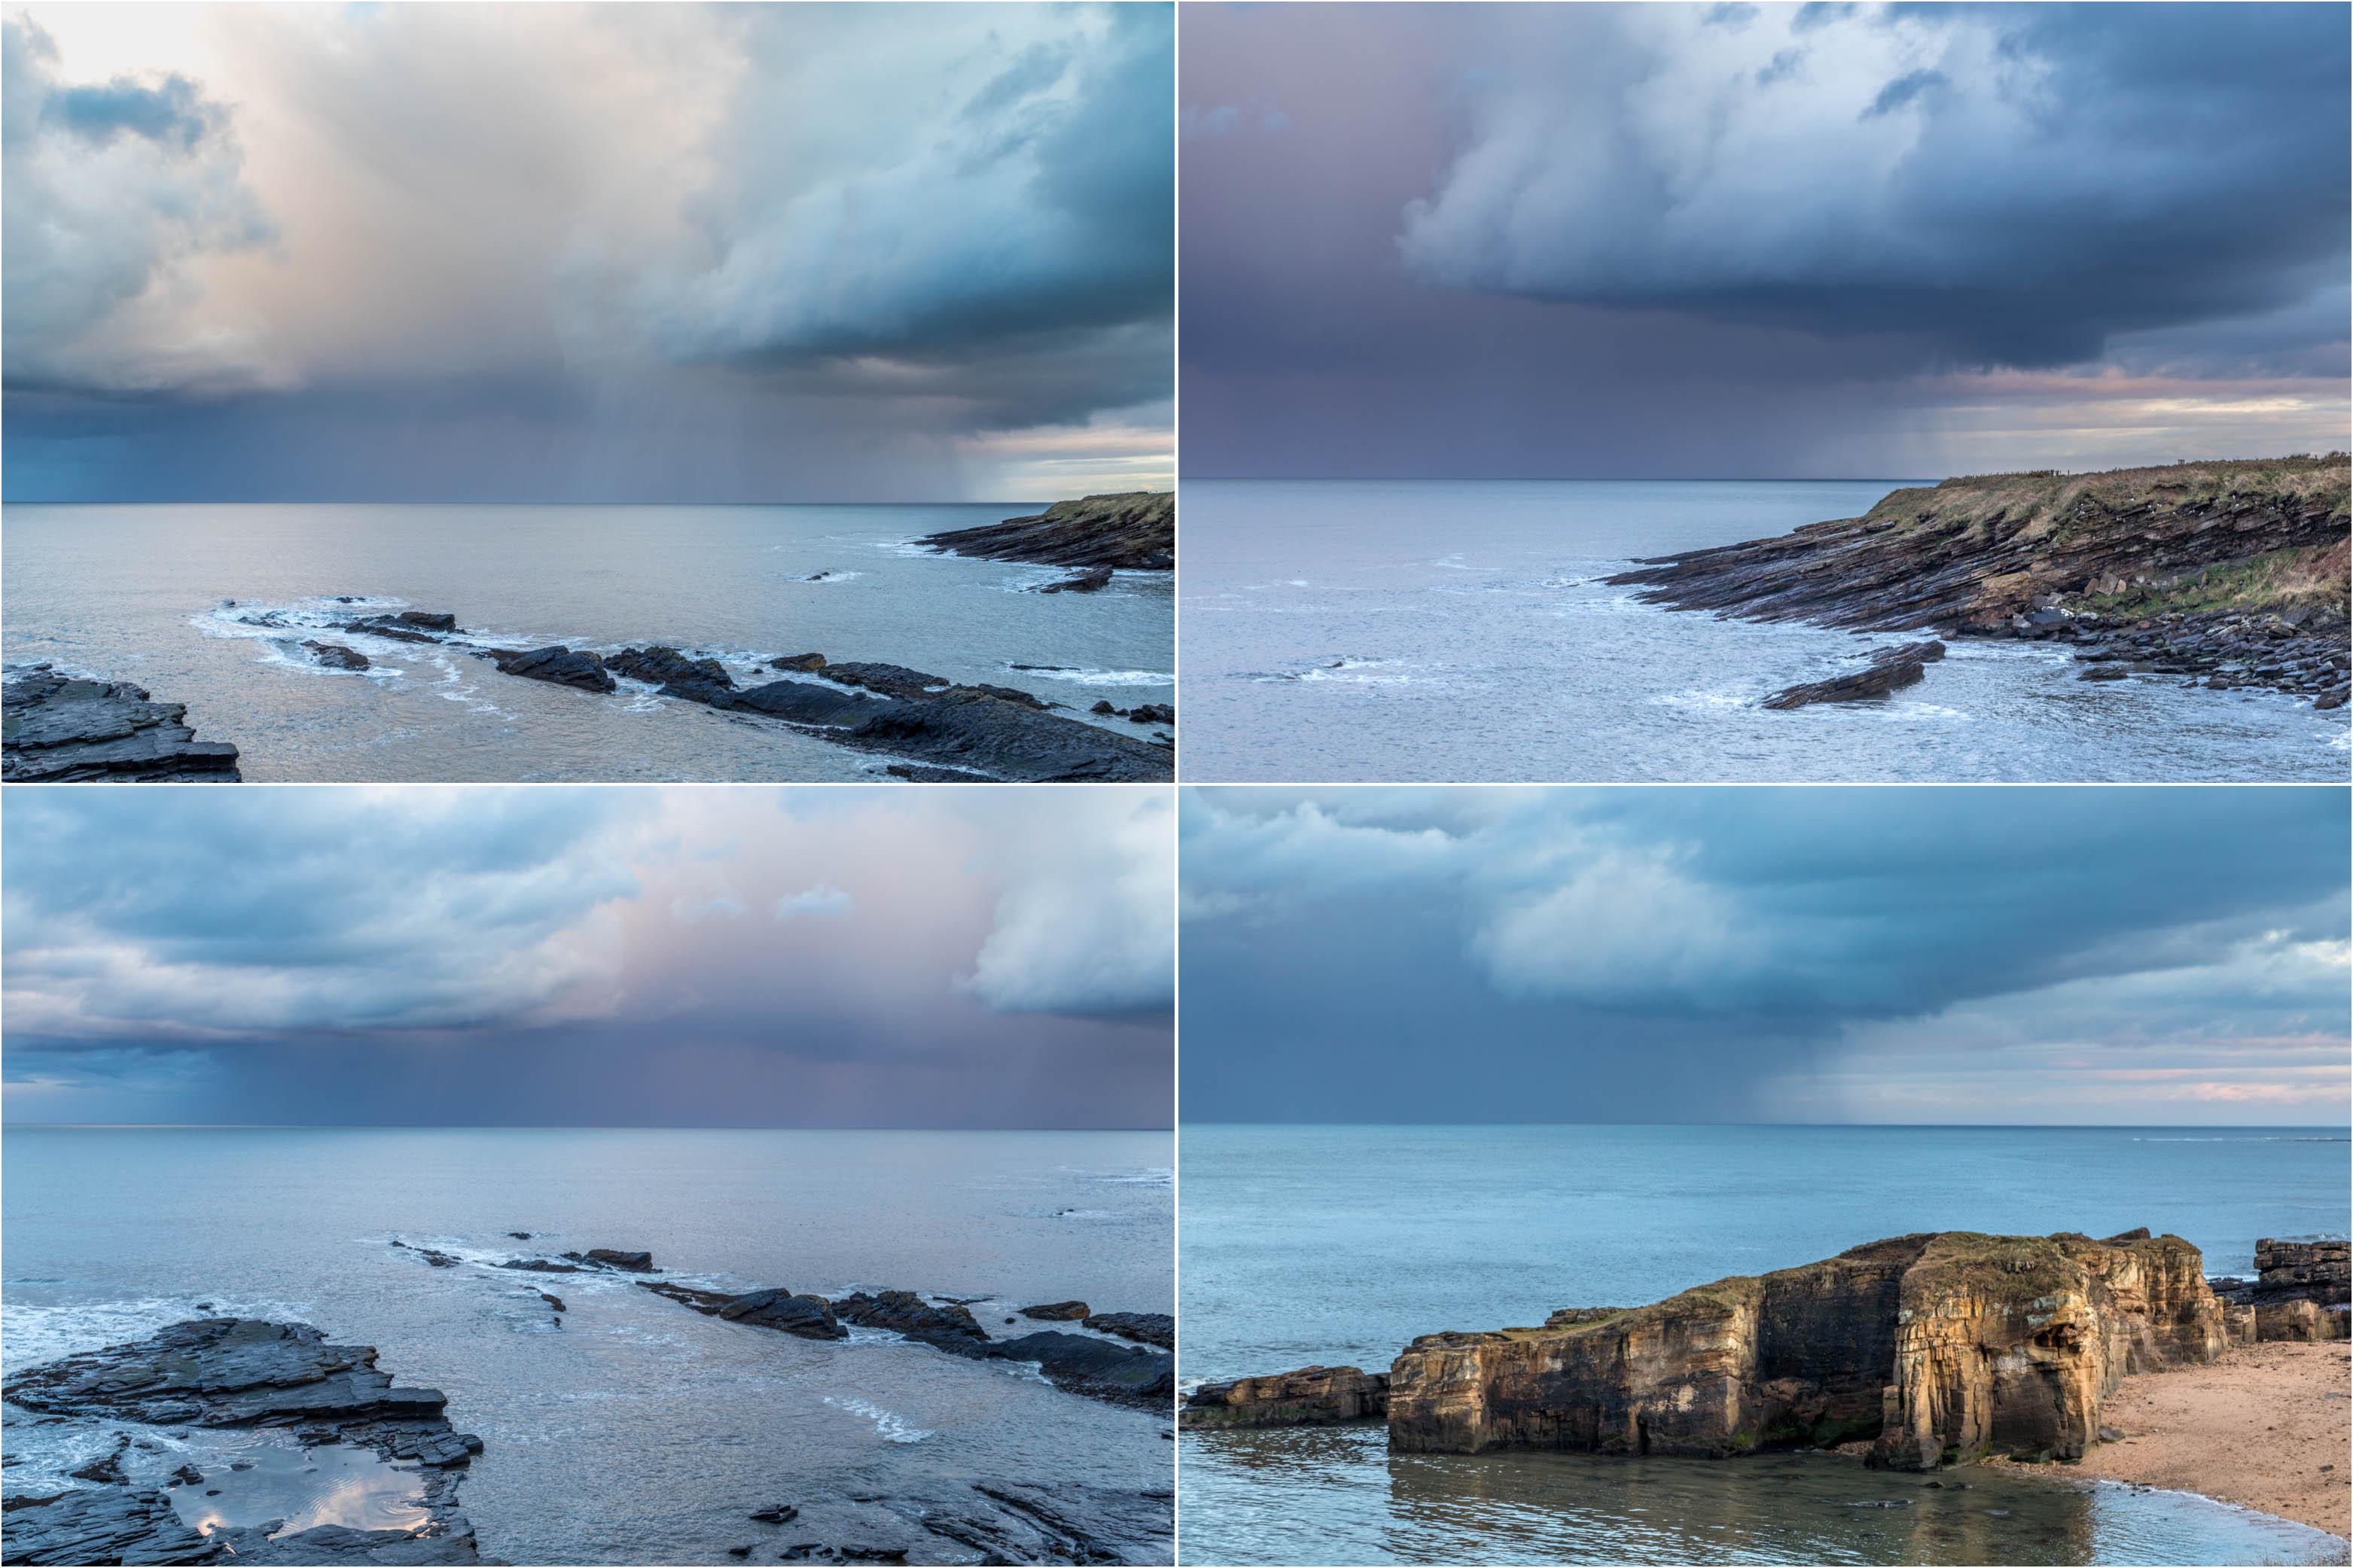 Bathing House views, Northumberland coast